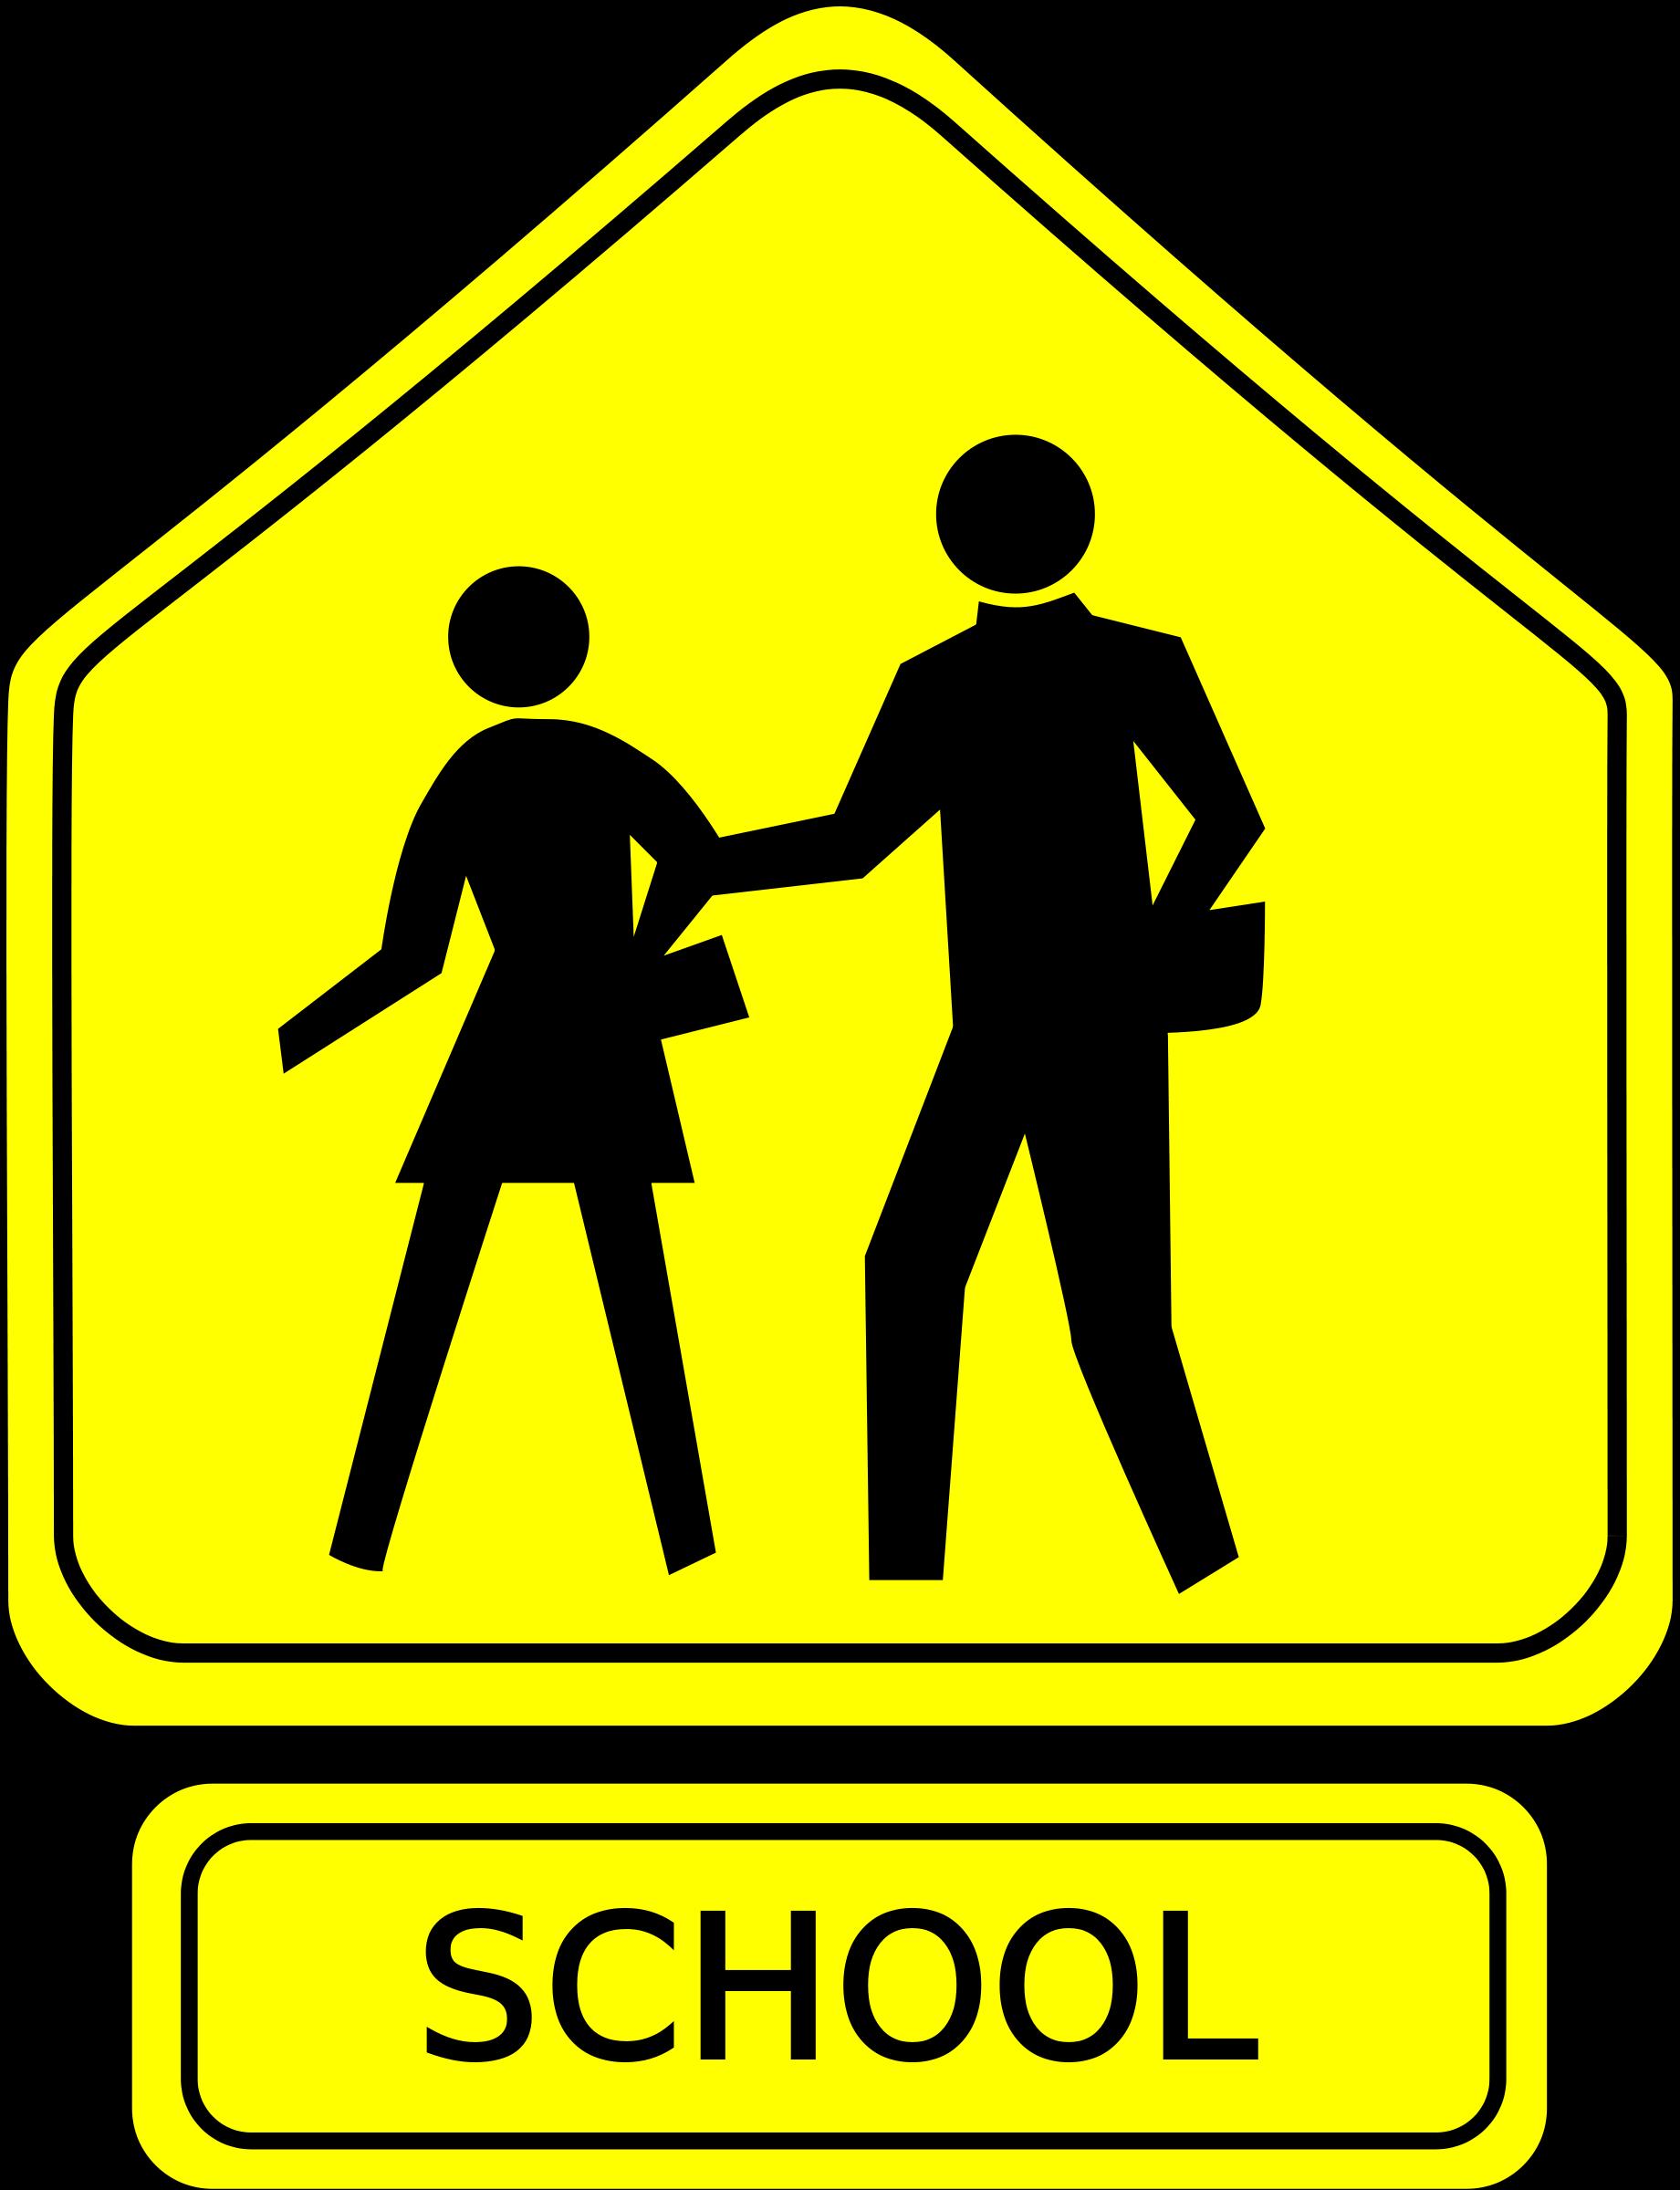 Traffic clipart school traffic #3